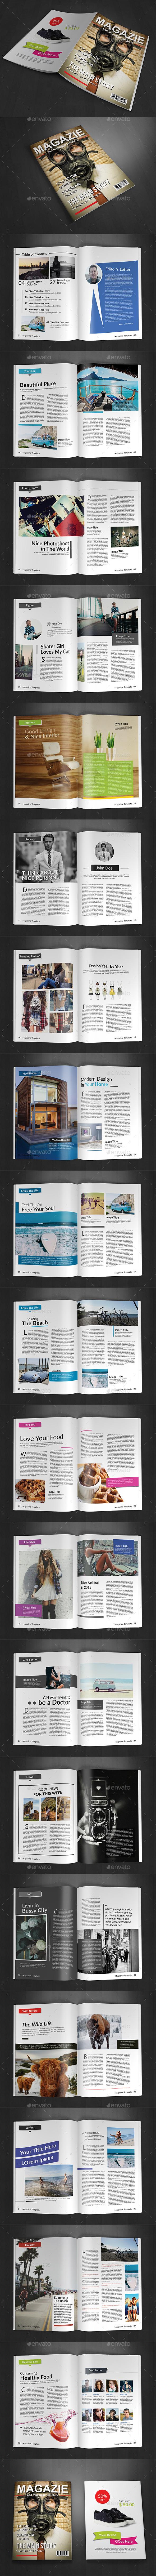 A4 Magazine Template Vol. 11 - Magazines Print Templates